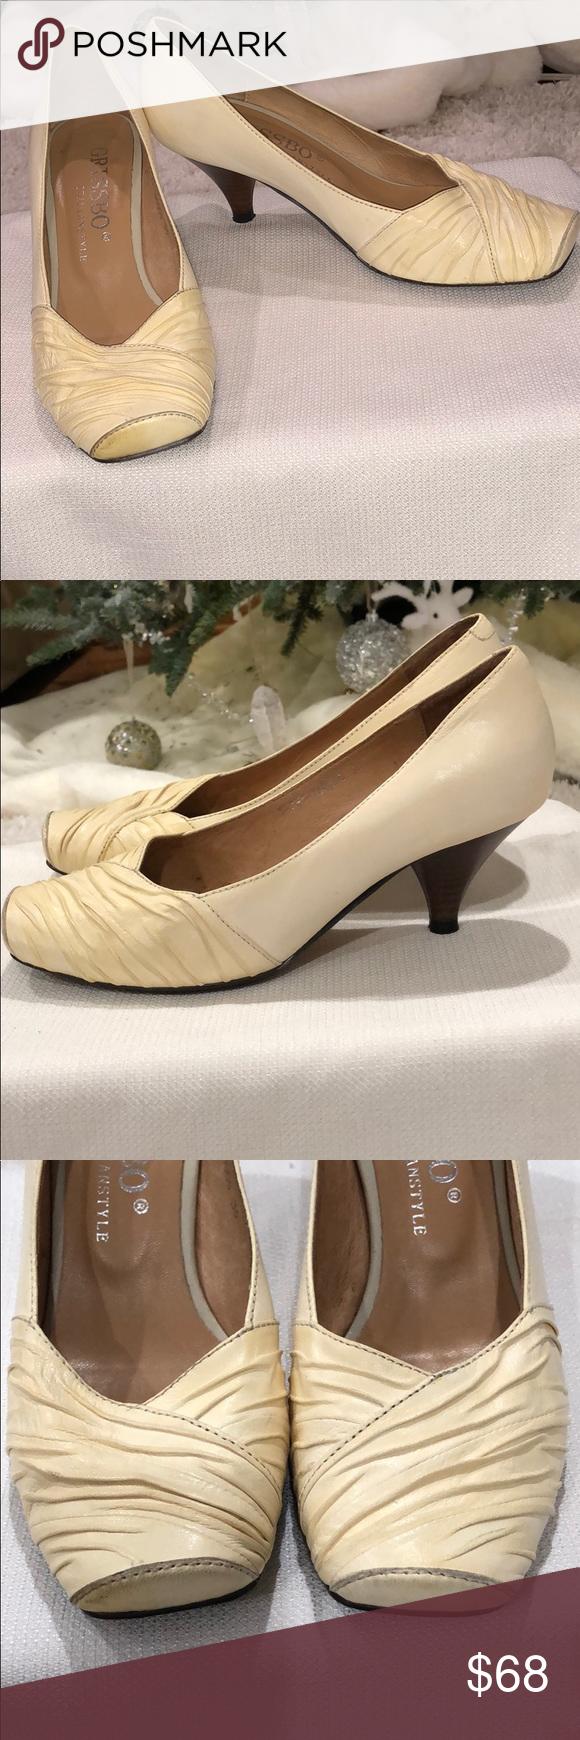 Vintage Shoes Vintage Shoes Shoes Fashion Shoes